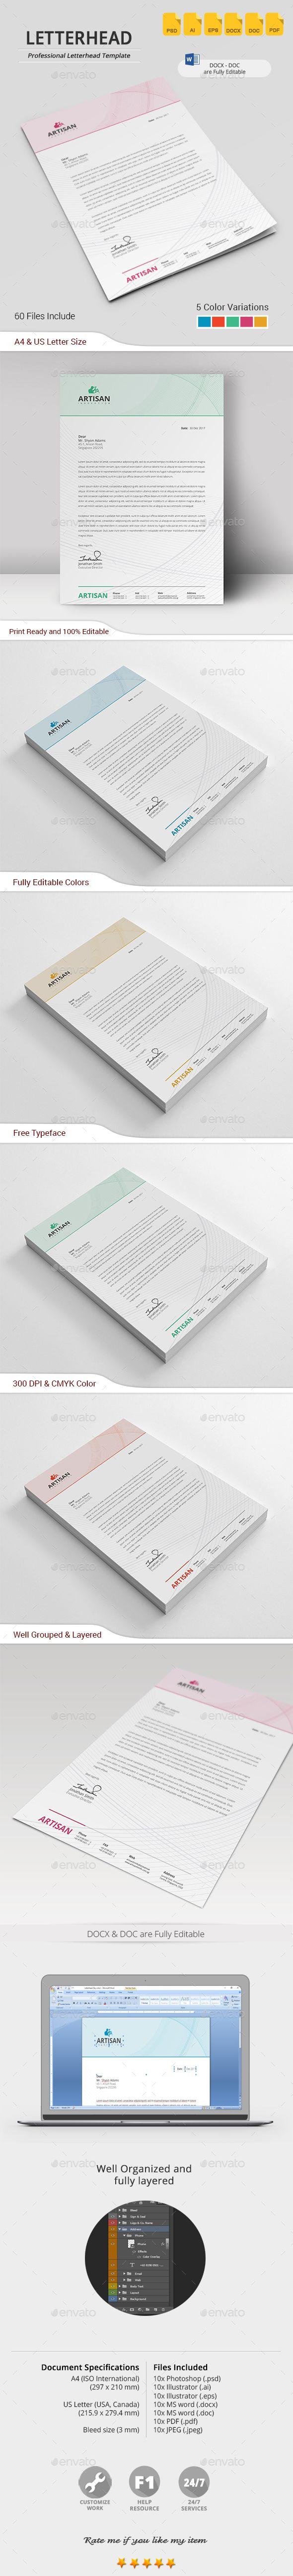 Letterhead — Photoshop PSD #template #paper • Download ➝ https://graphicriver.net/item/letterhead/19760662?ref=pxcr